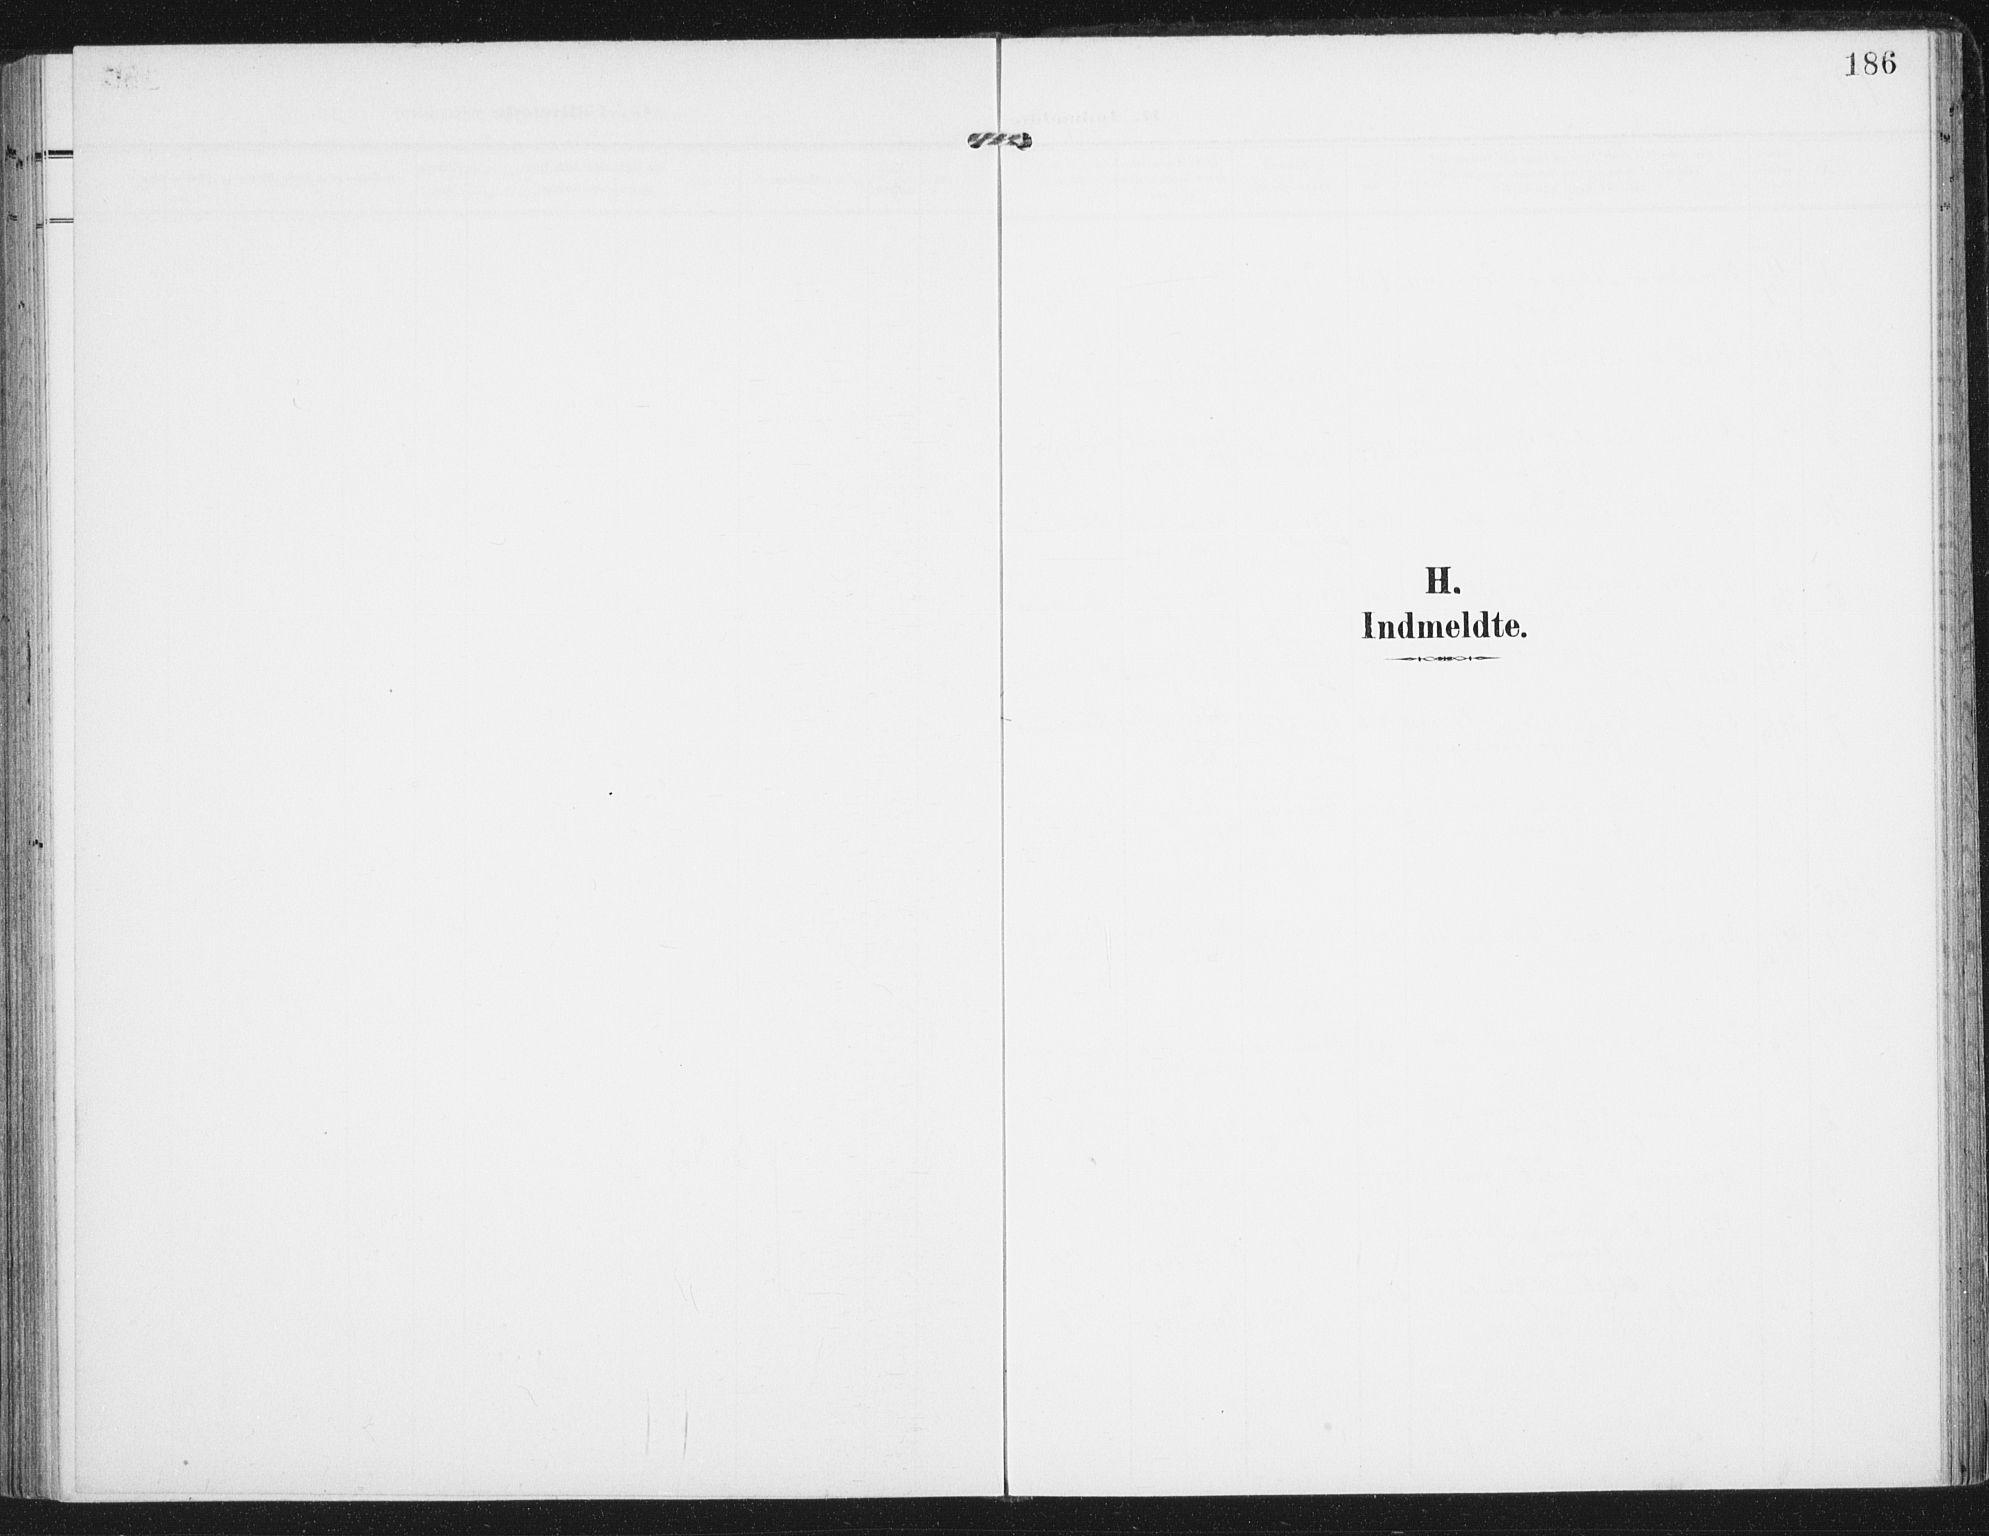 SAT, Ministerialprotokoller, klokkerbøker og fødselsregistre - Nordland, 885/L1206: Ministerialbok nr. 885A07, 1905-1915, s. 186